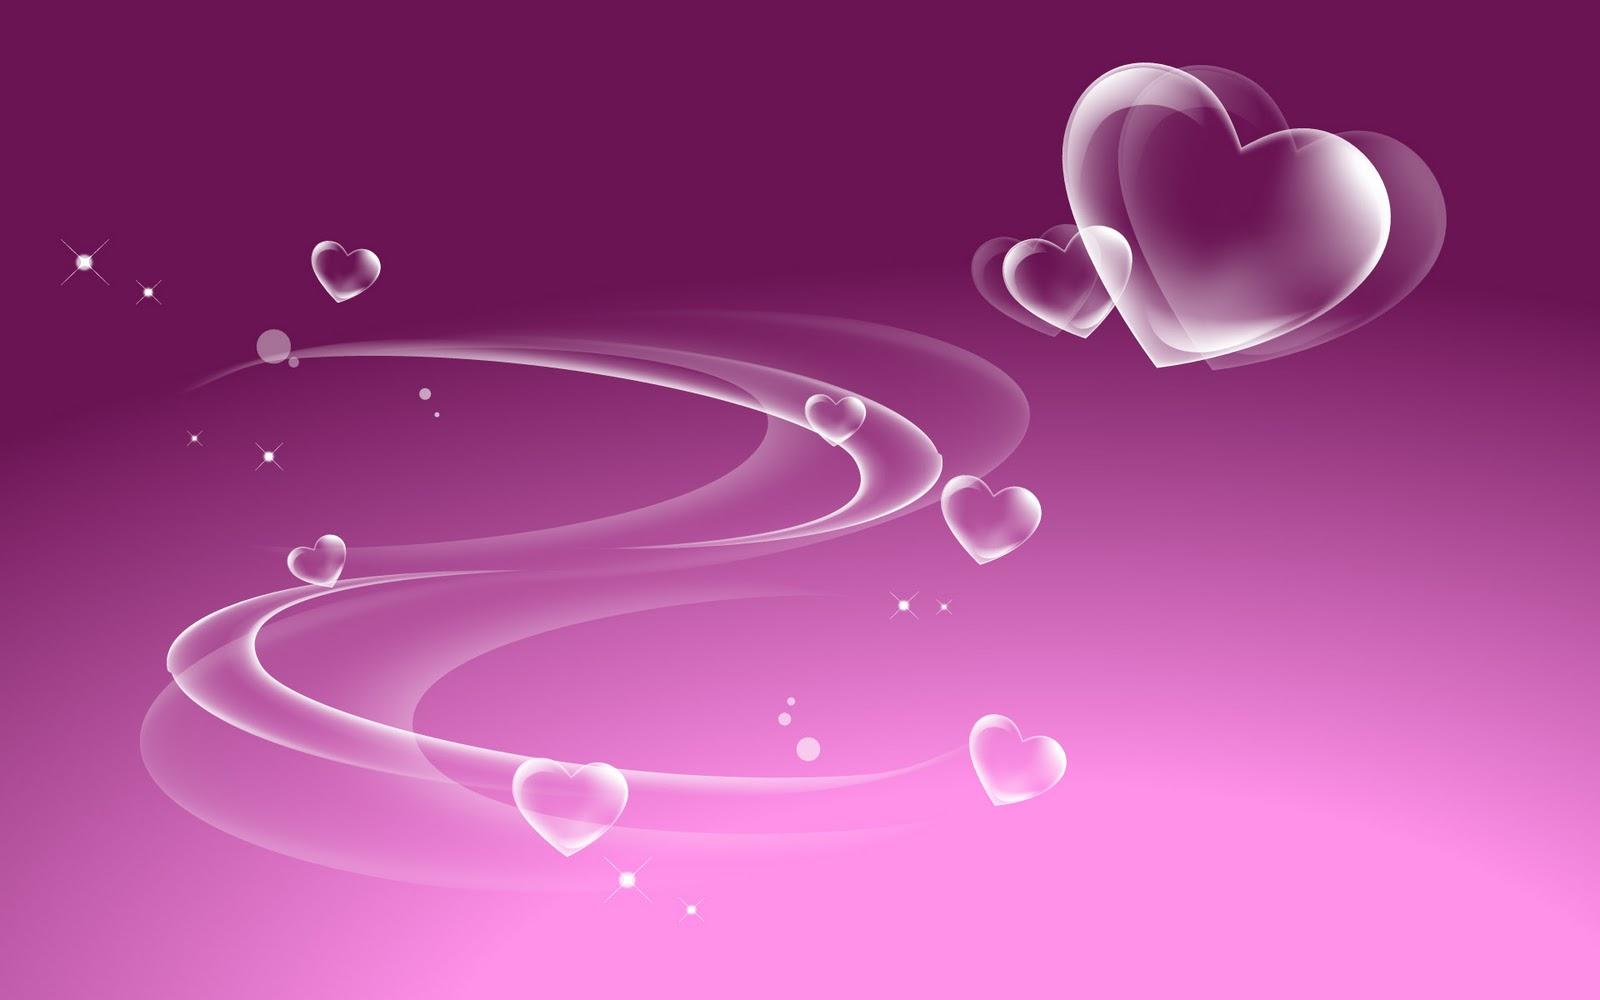 img download valentine screensavers pic download valentine 1600x1000